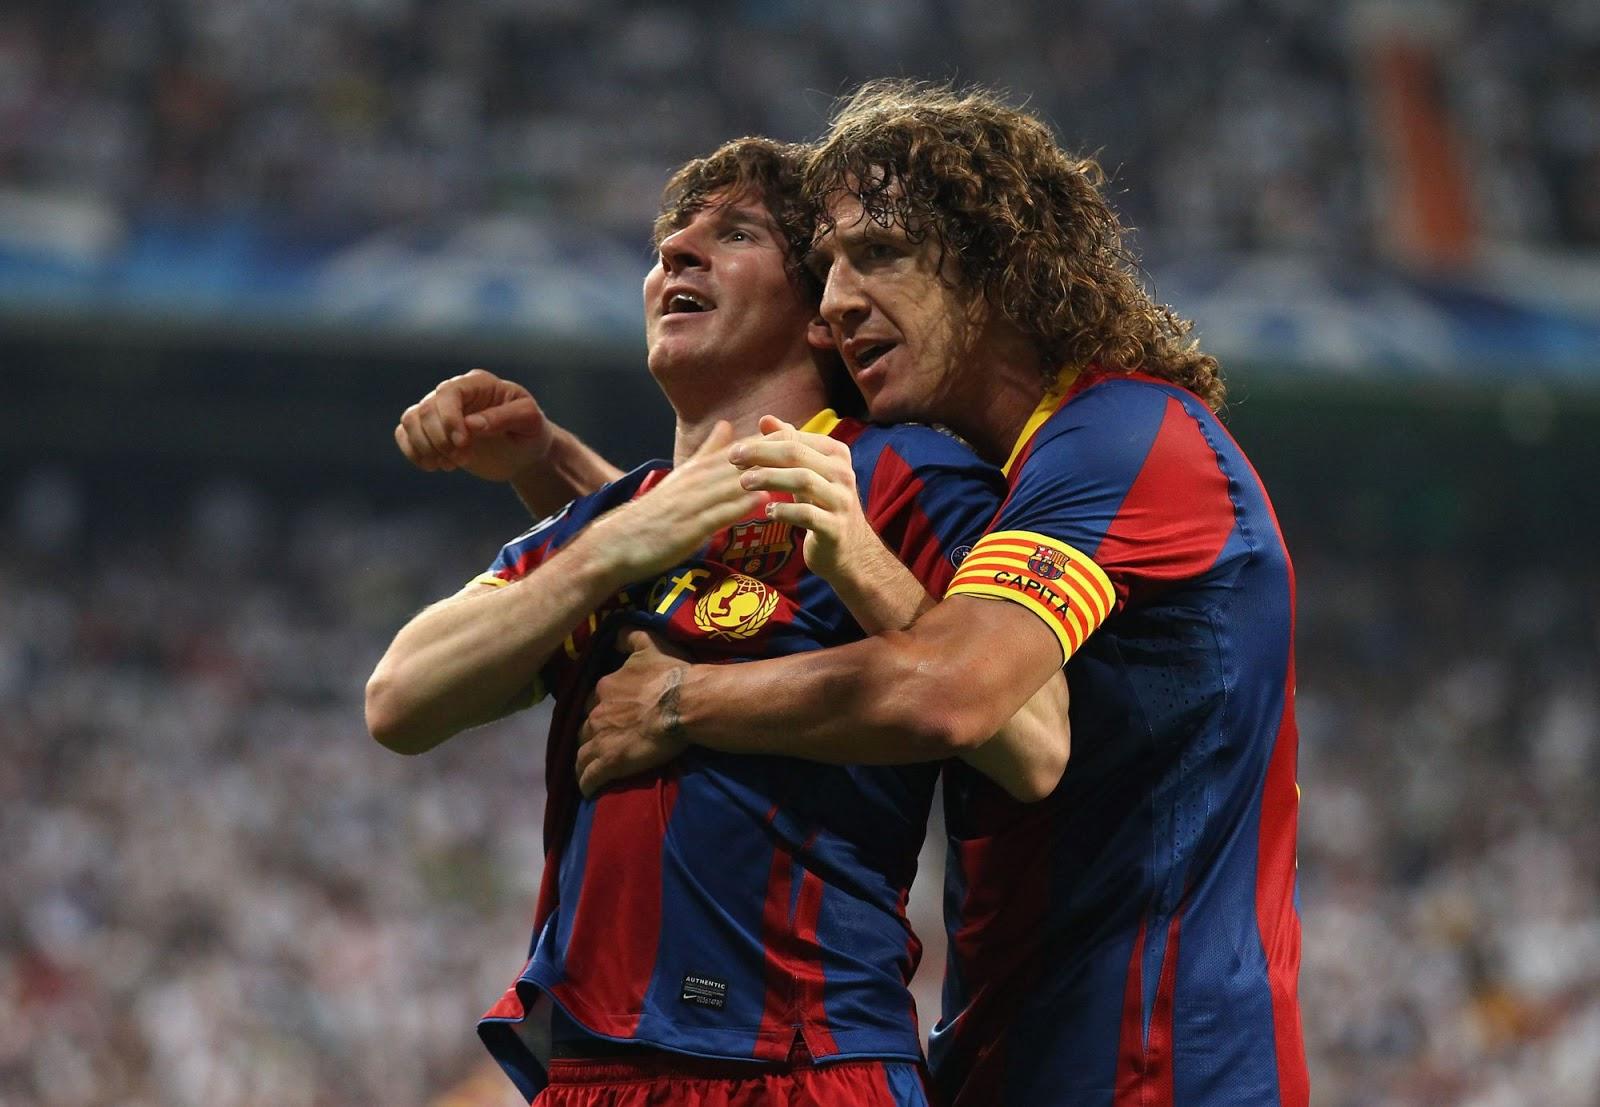 Borrar Paine Gillic Nos vemos  30+ Most Iconic Captain Armbands In Football | Ajax, Barcelona & Many More  - Footy Headlines